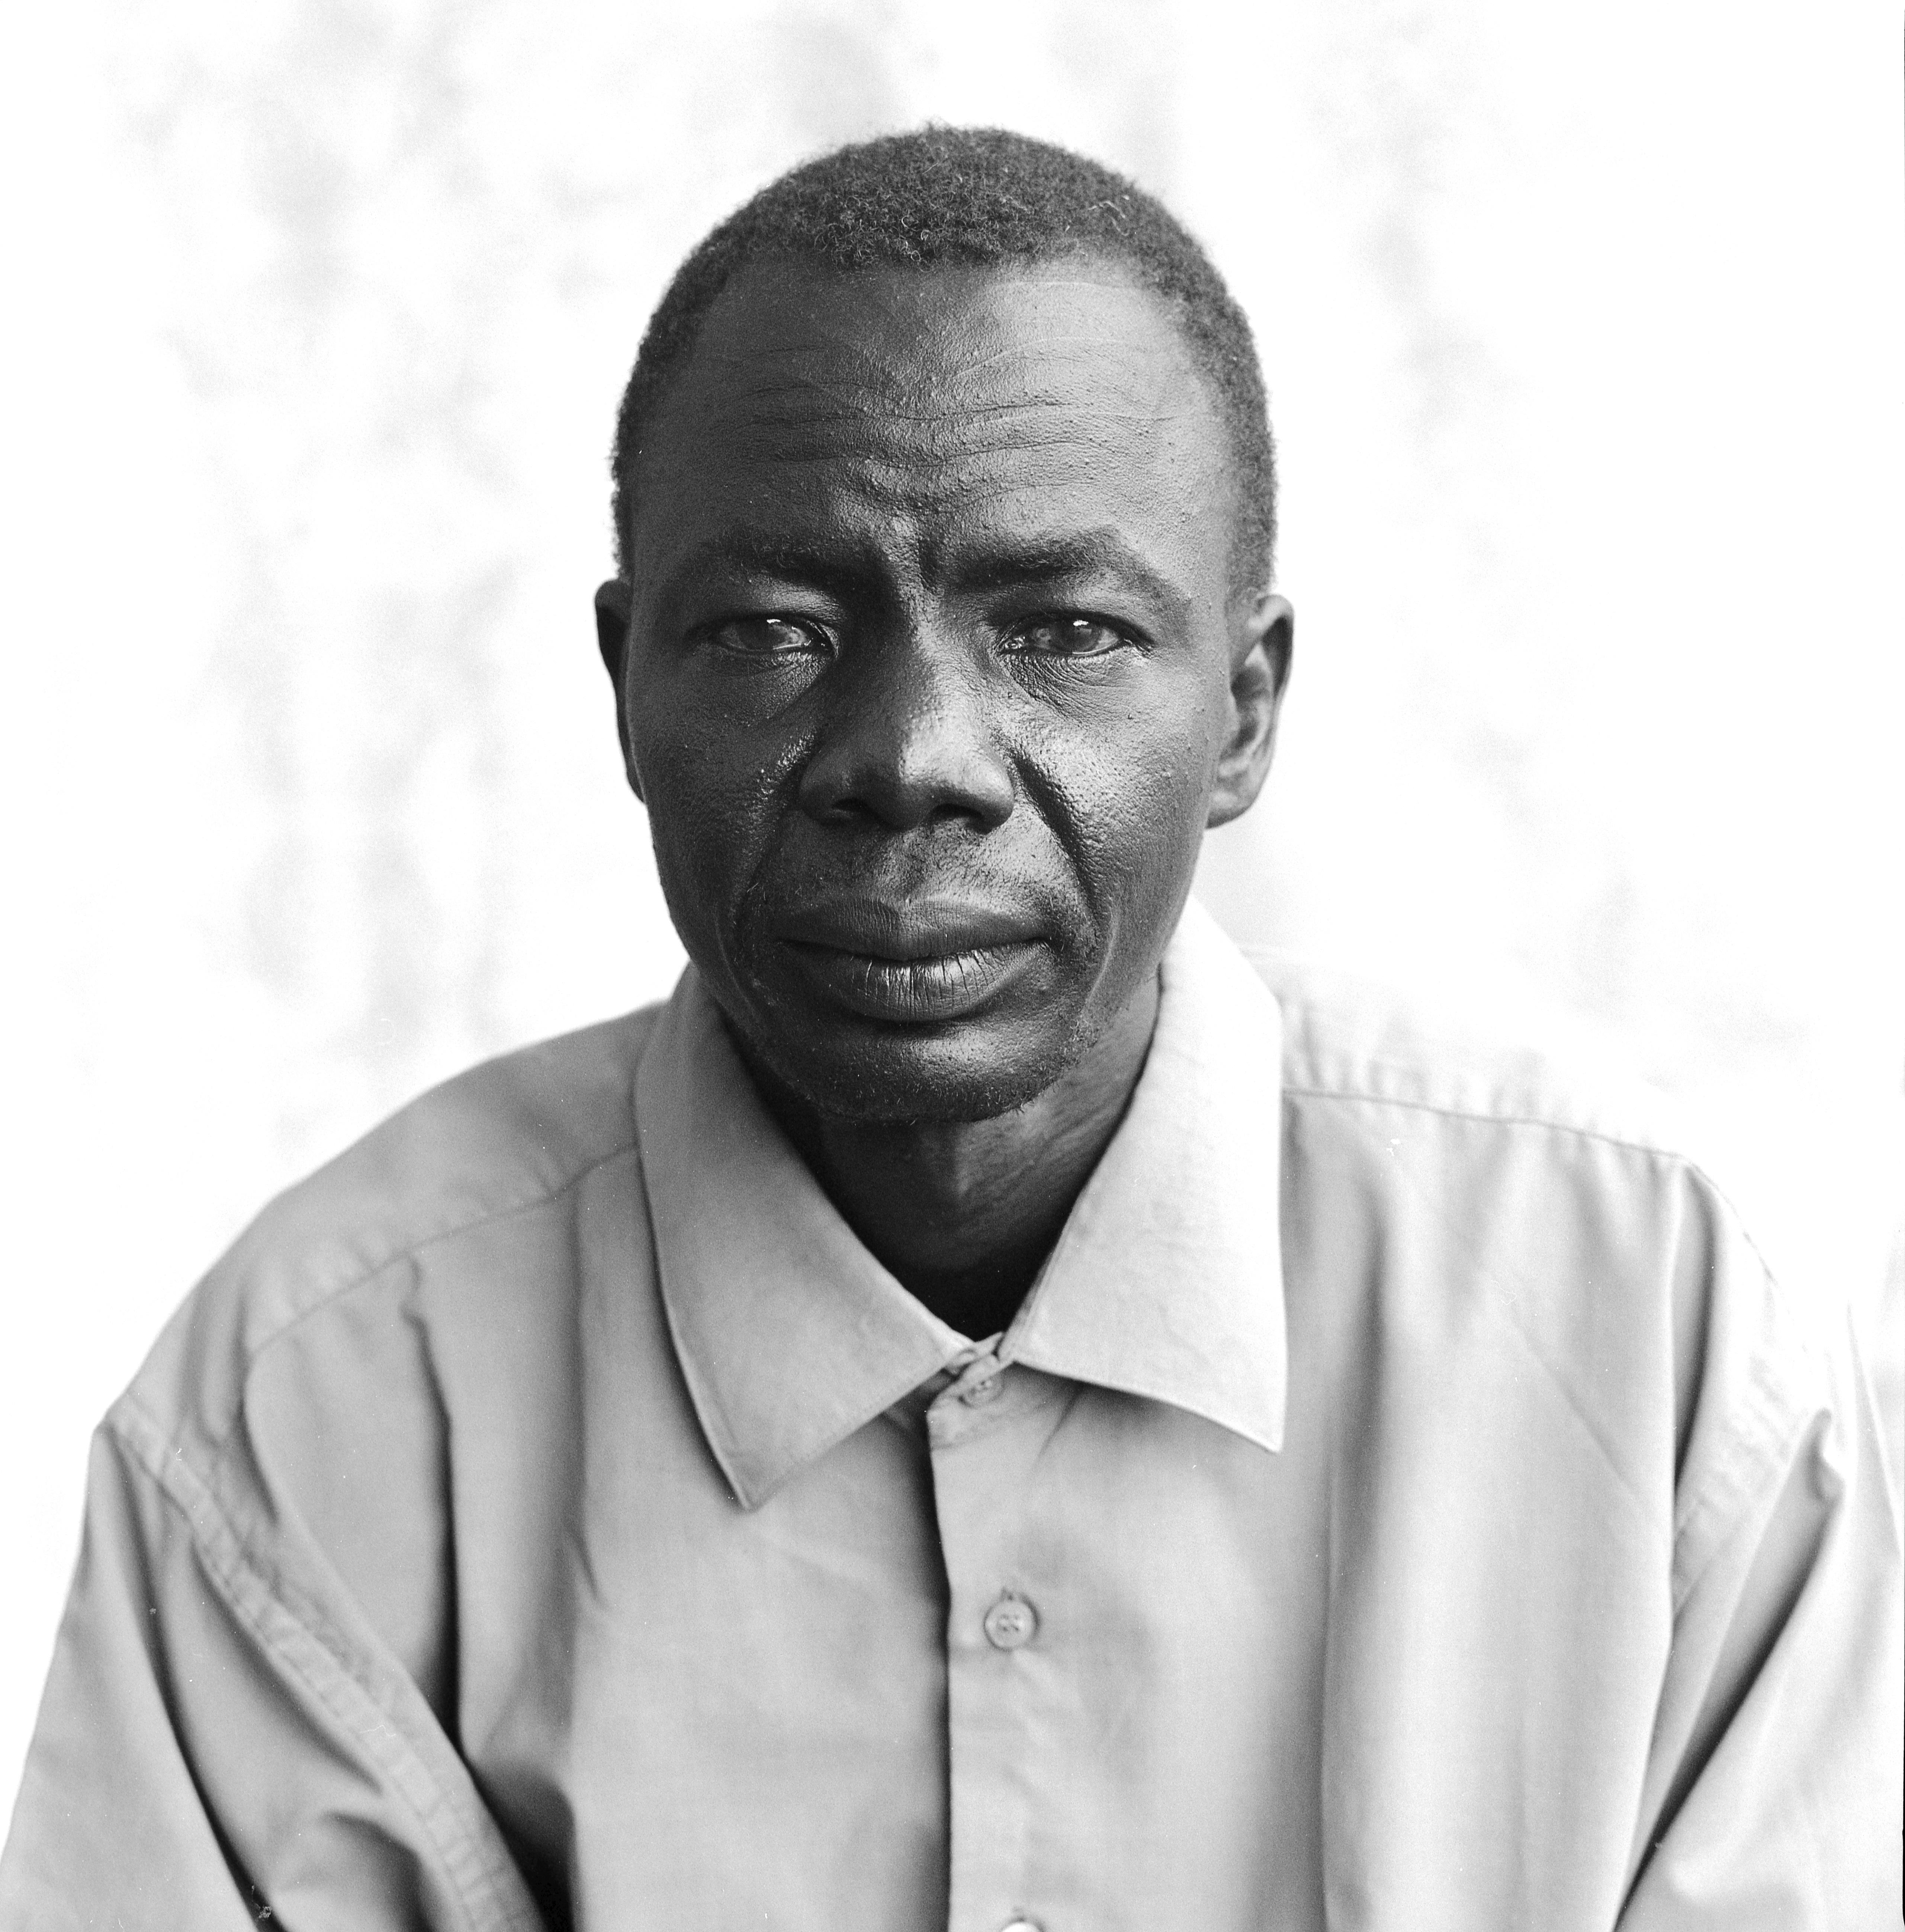 Victor Garang - 36